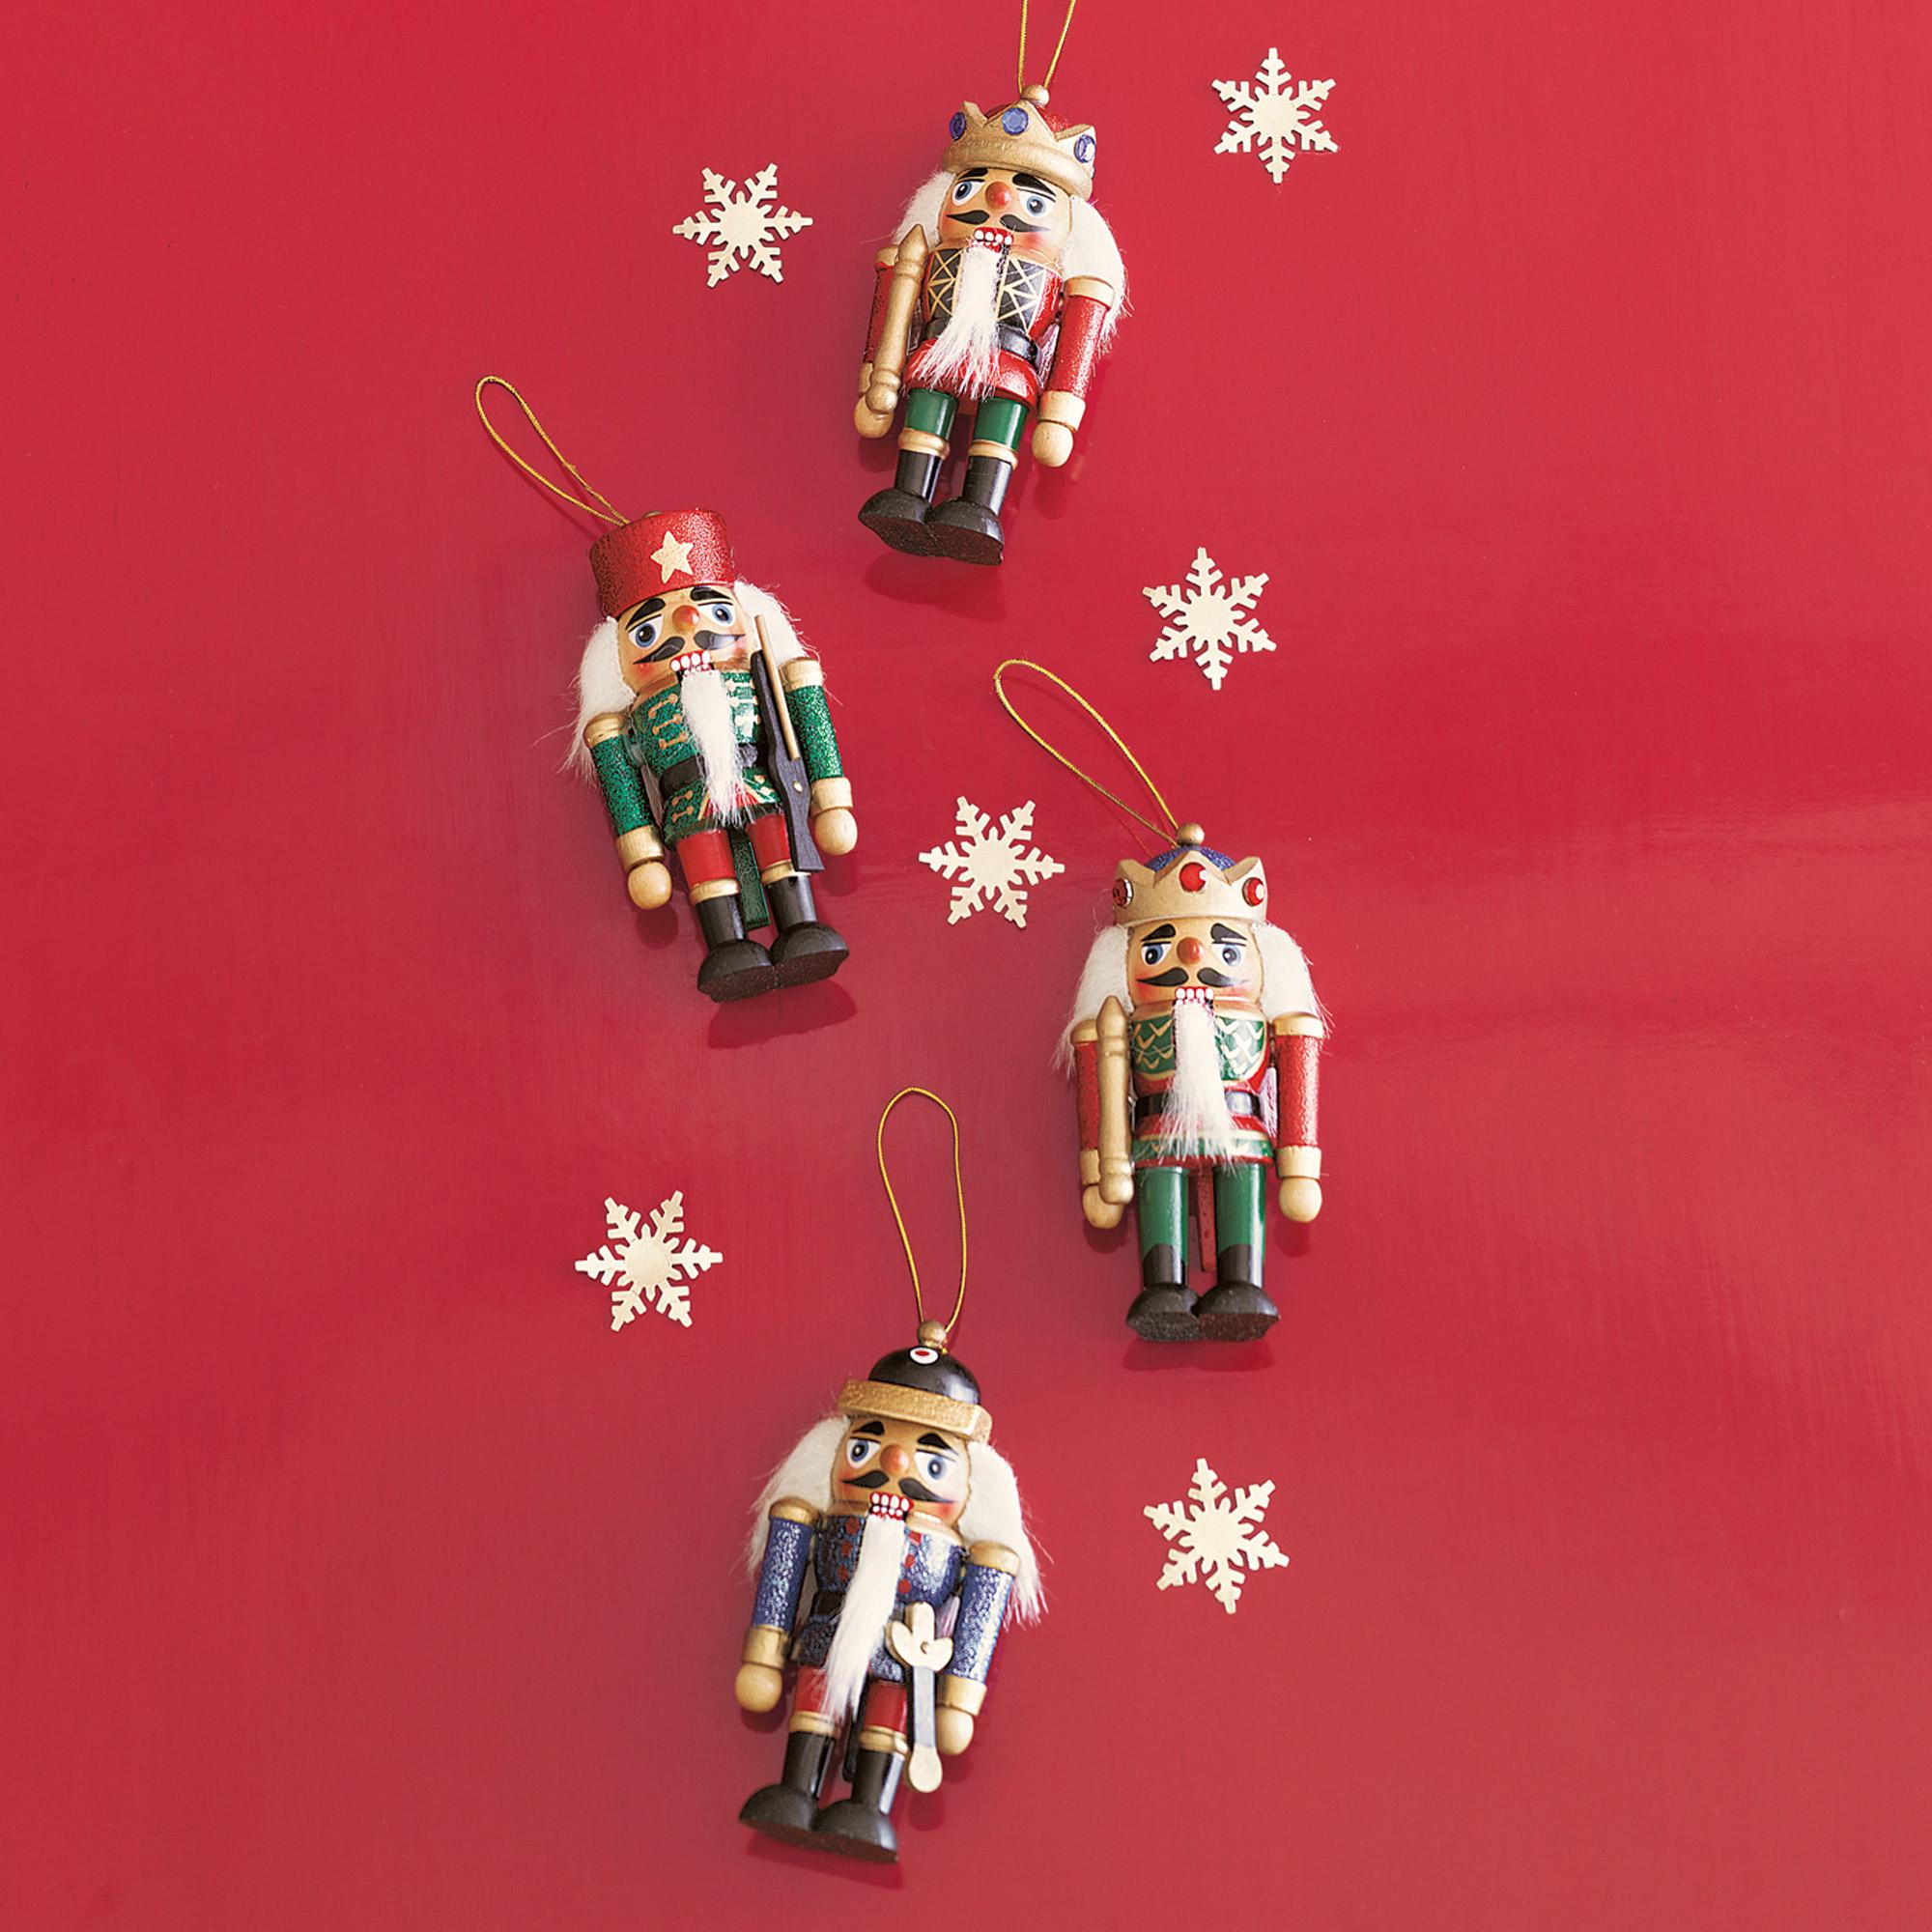 Wooden Nutcracker Ornaments